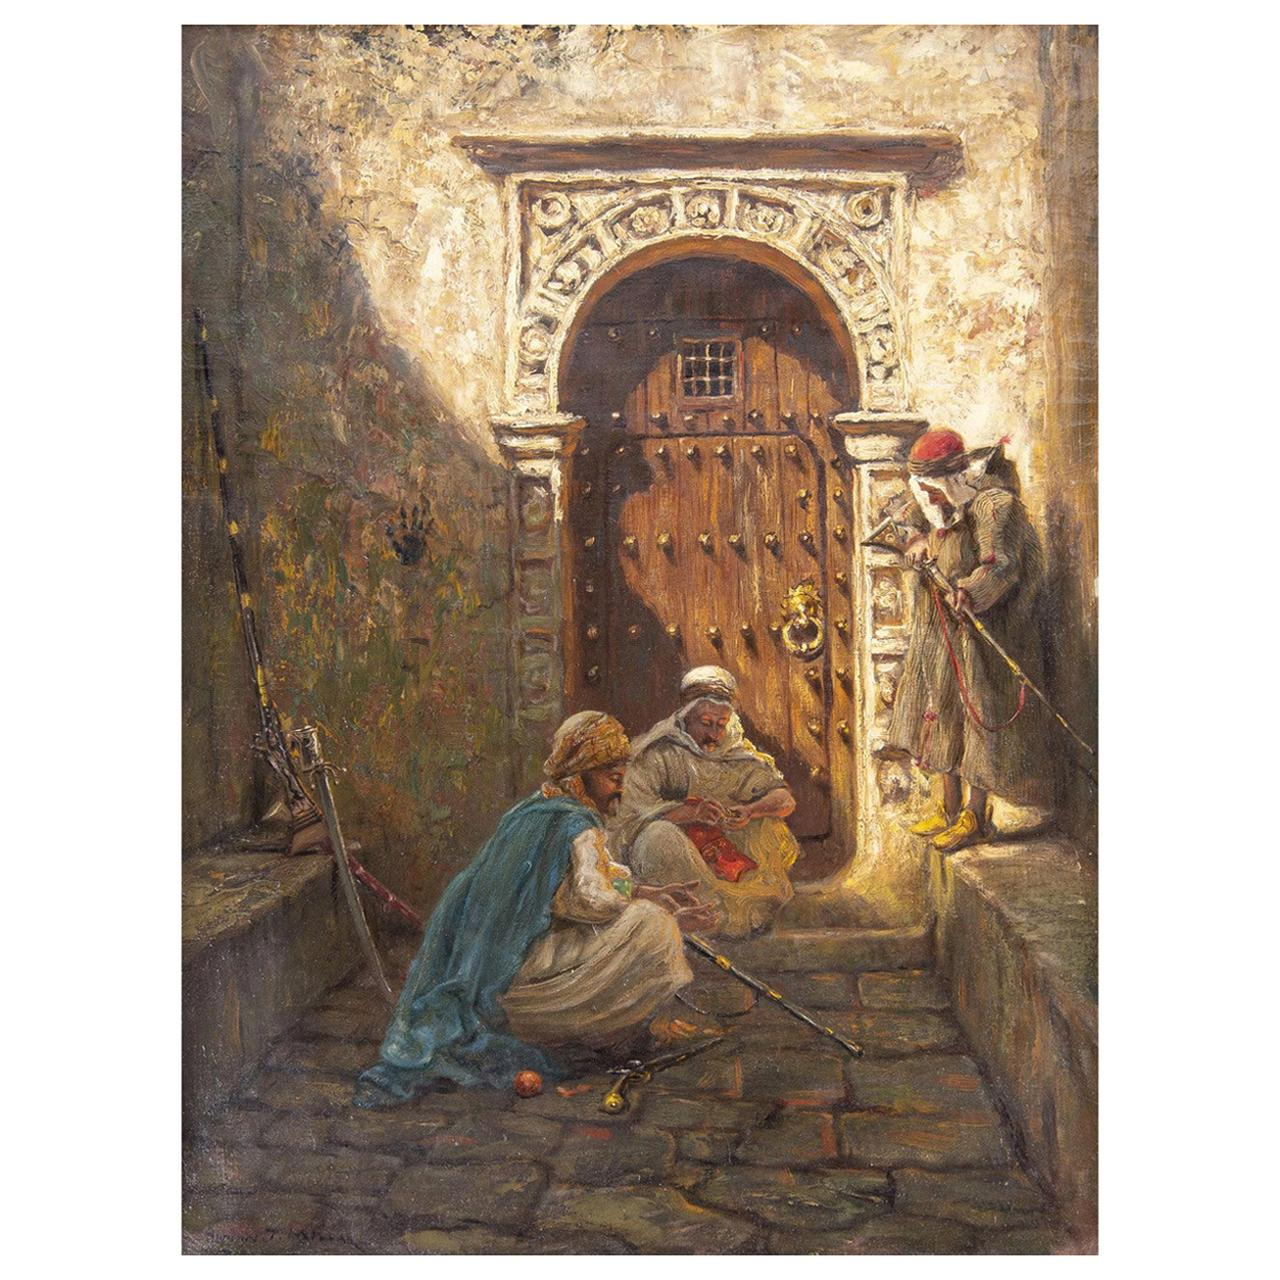 Fine Orientalist Painting Entitled Guarding the Harem by Addison Millar